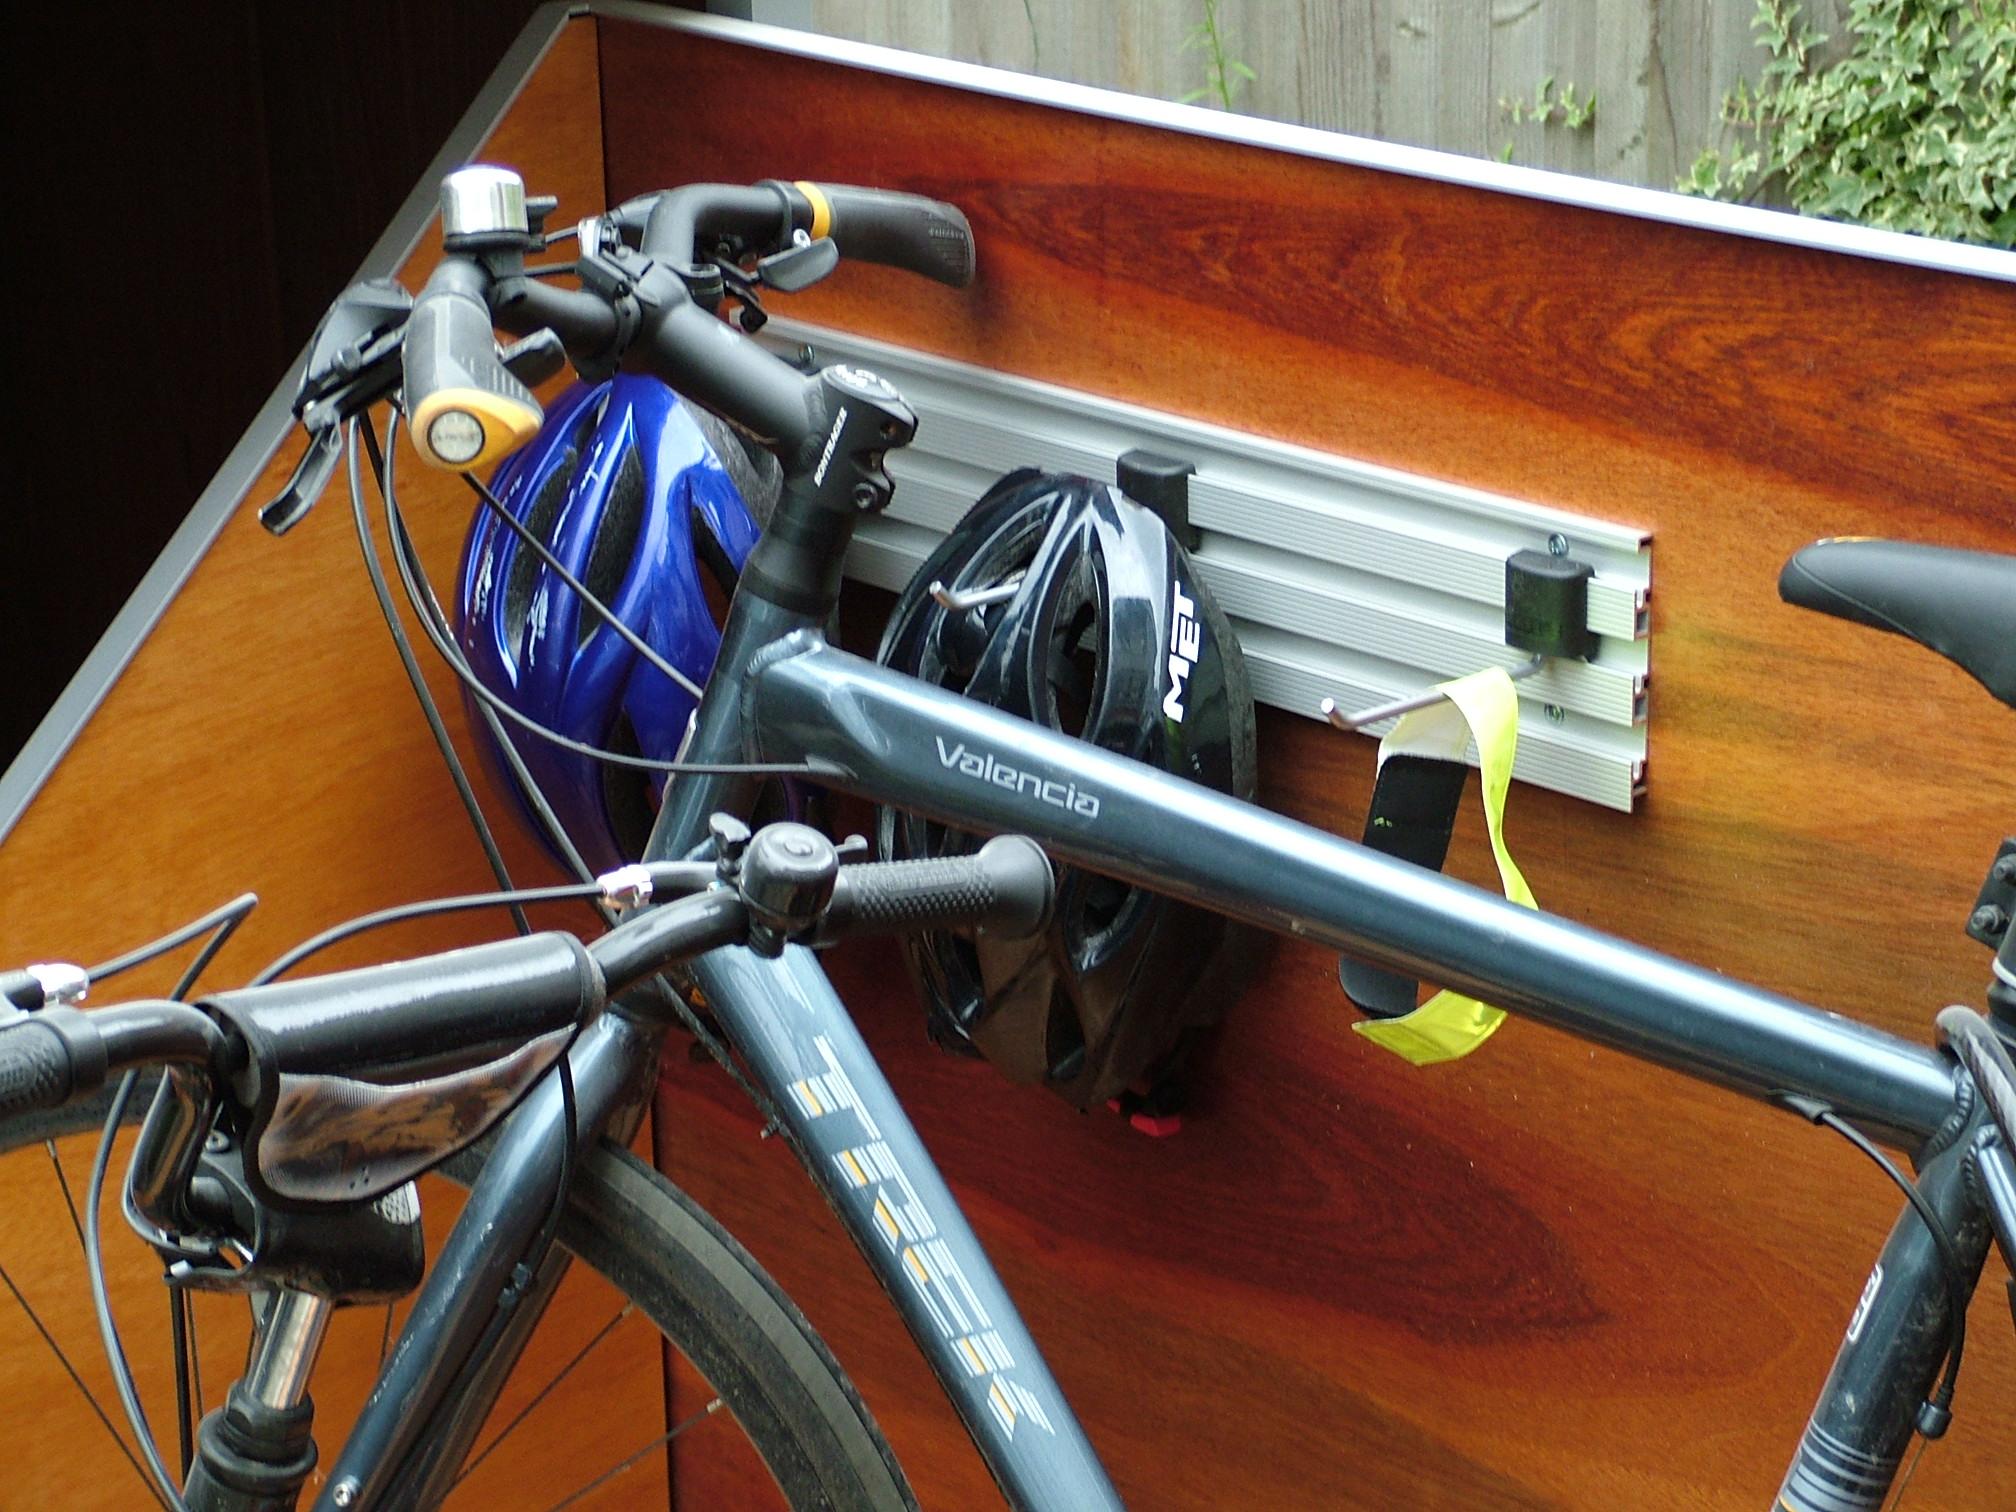 Bike store detail